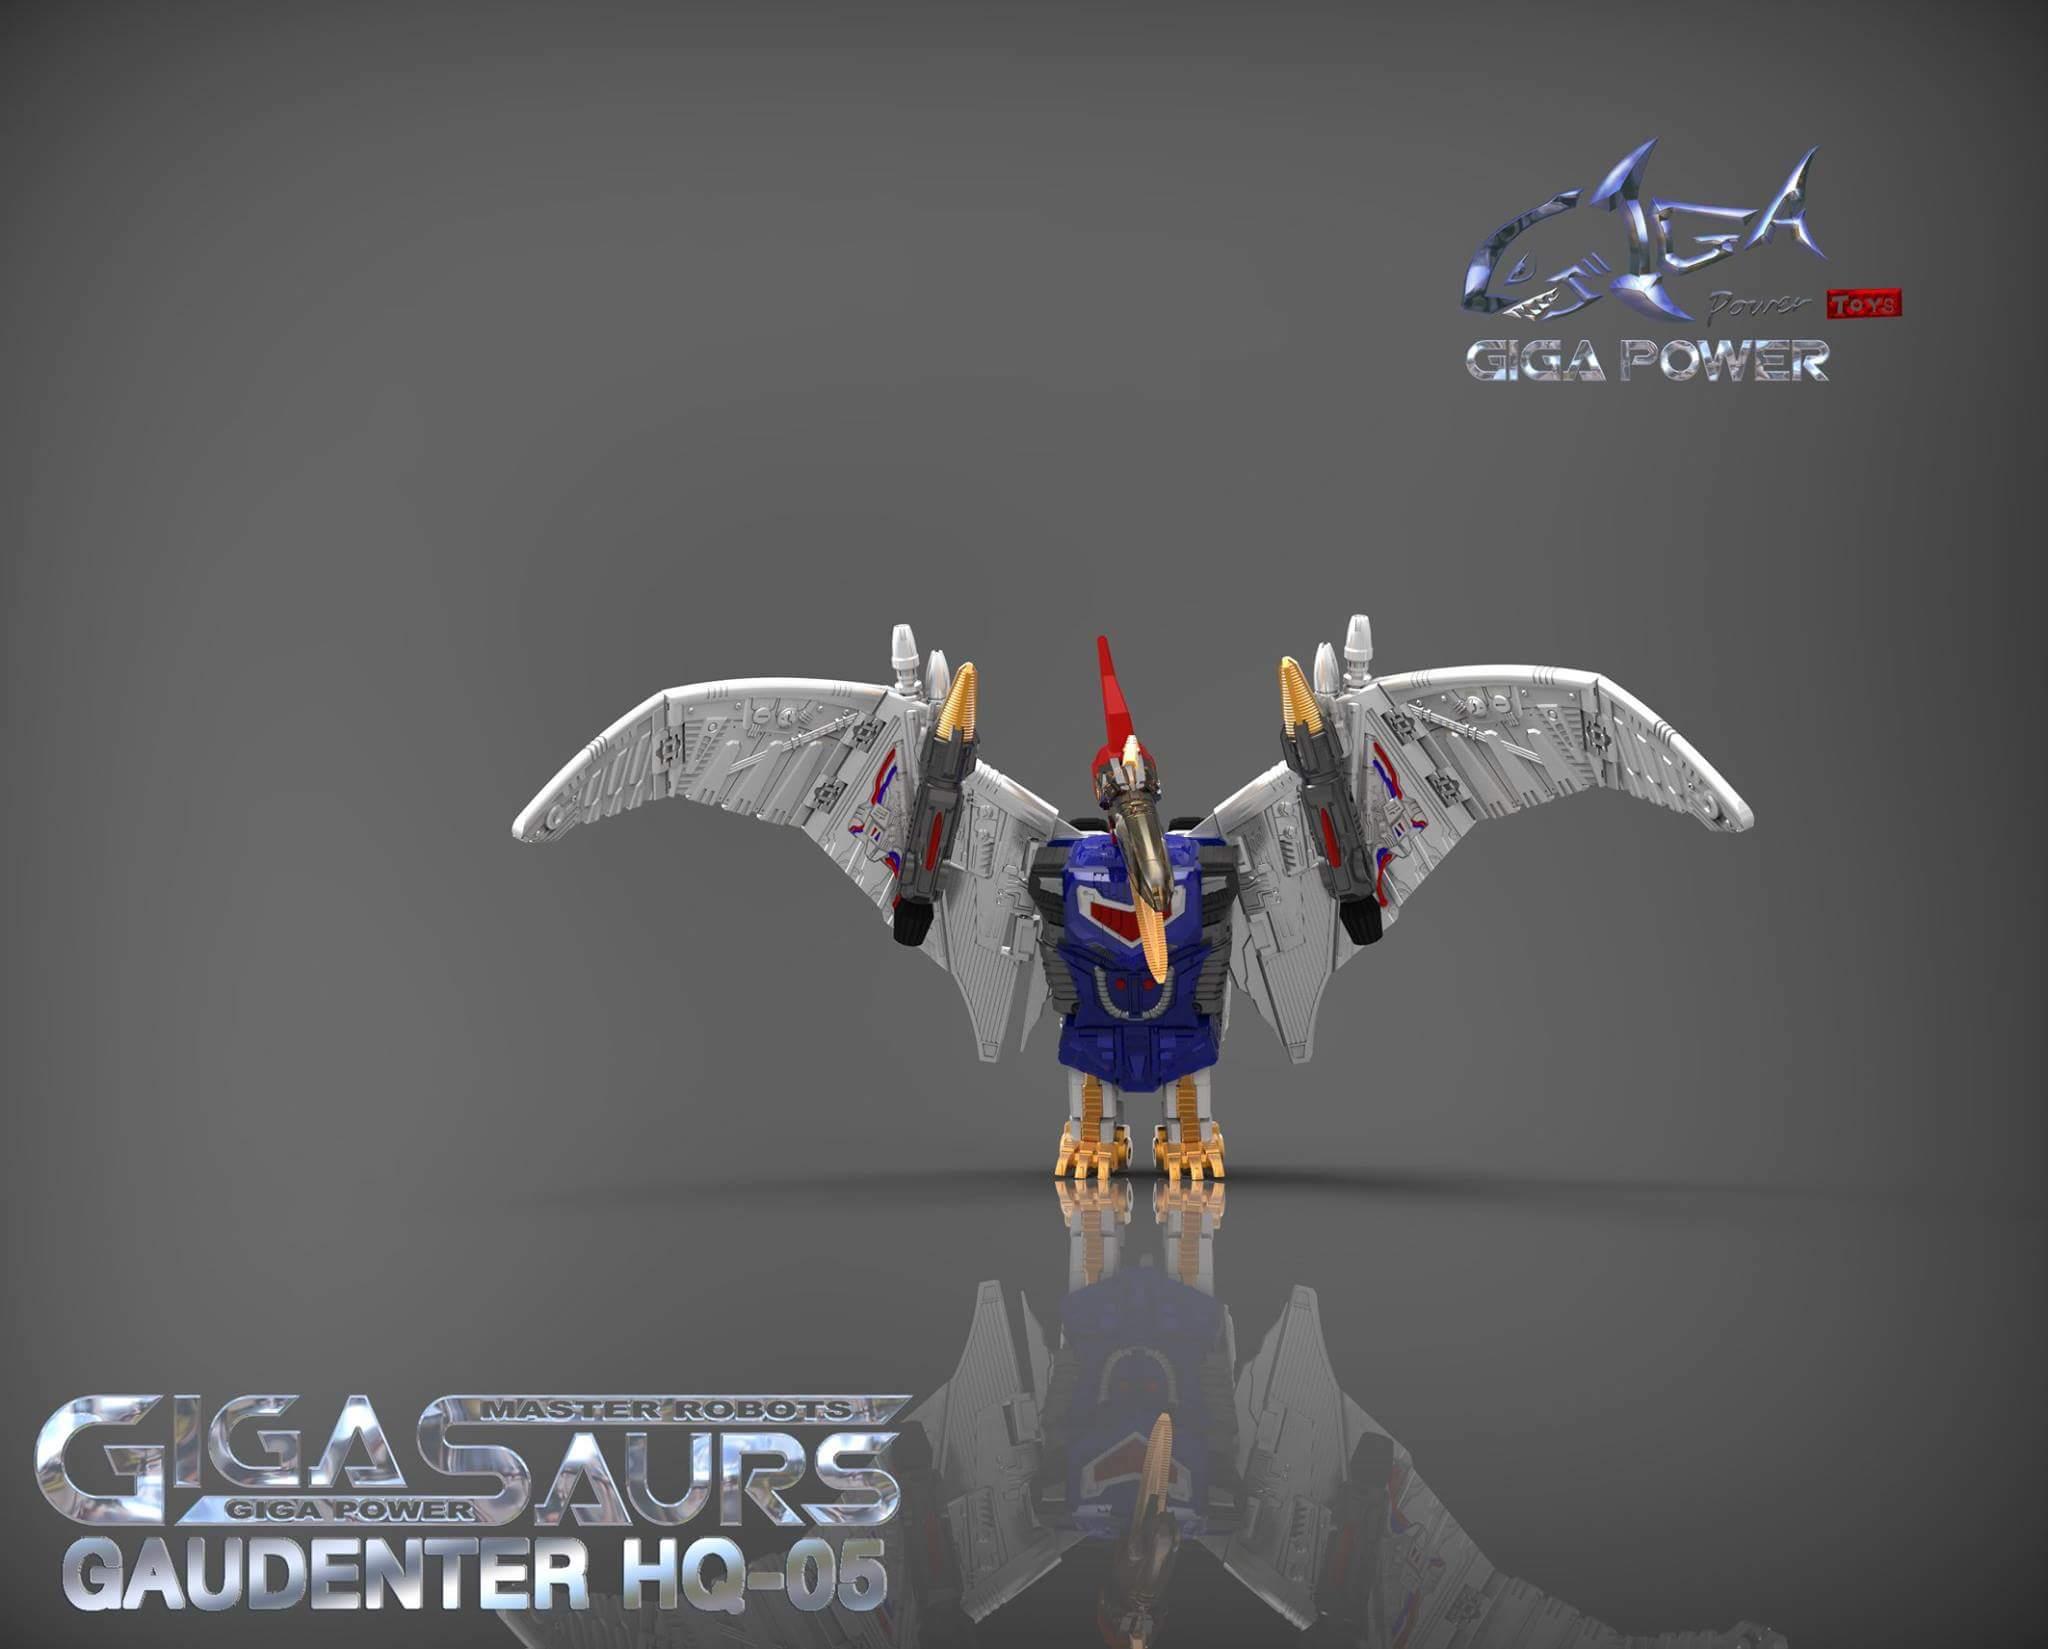 [GigaPower] Produit Tiers - Jouets HQ-01 Superator + HQ-02 Grassor + HQ-03 Guttur + HQ-04 Graviter + HQ-05 Gaudenter - aka Dinobots - Page 4 H0L7vNlB